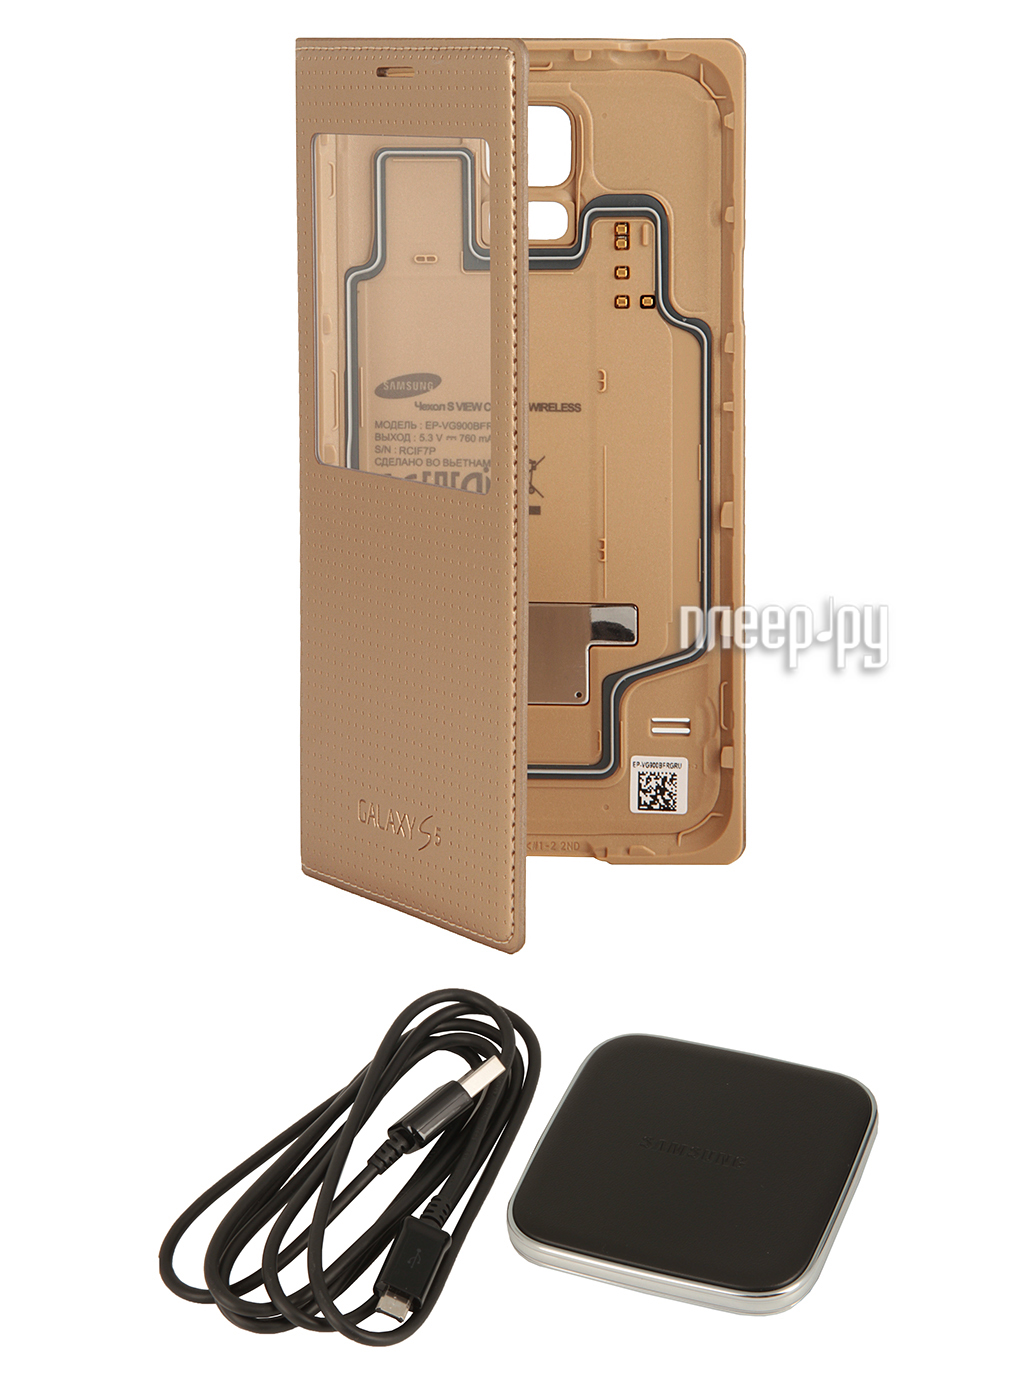 Аксессуар Чехол Samsung SM-G900F Galaxy S5 S-View EP-KG900PFRGRU Gold  Pleer.ru  2901.000